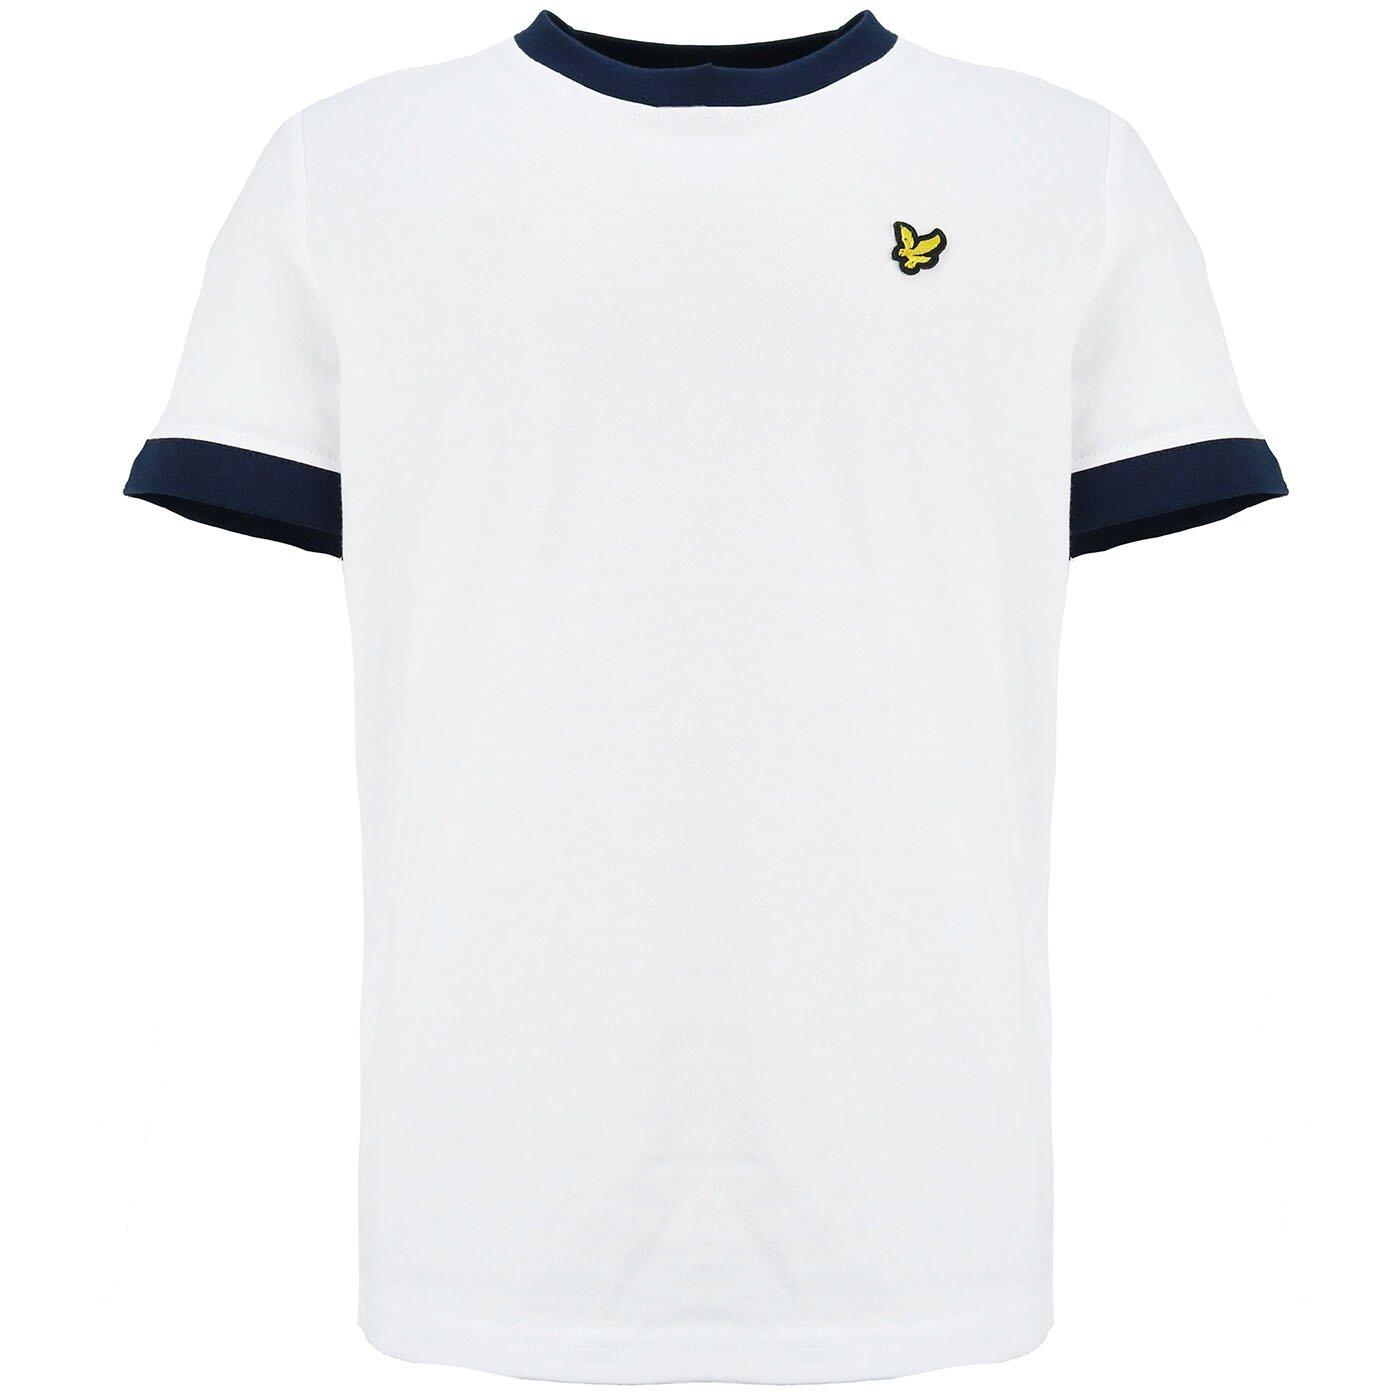 Lyle & Scott Ringer shirt bright white LSC0996